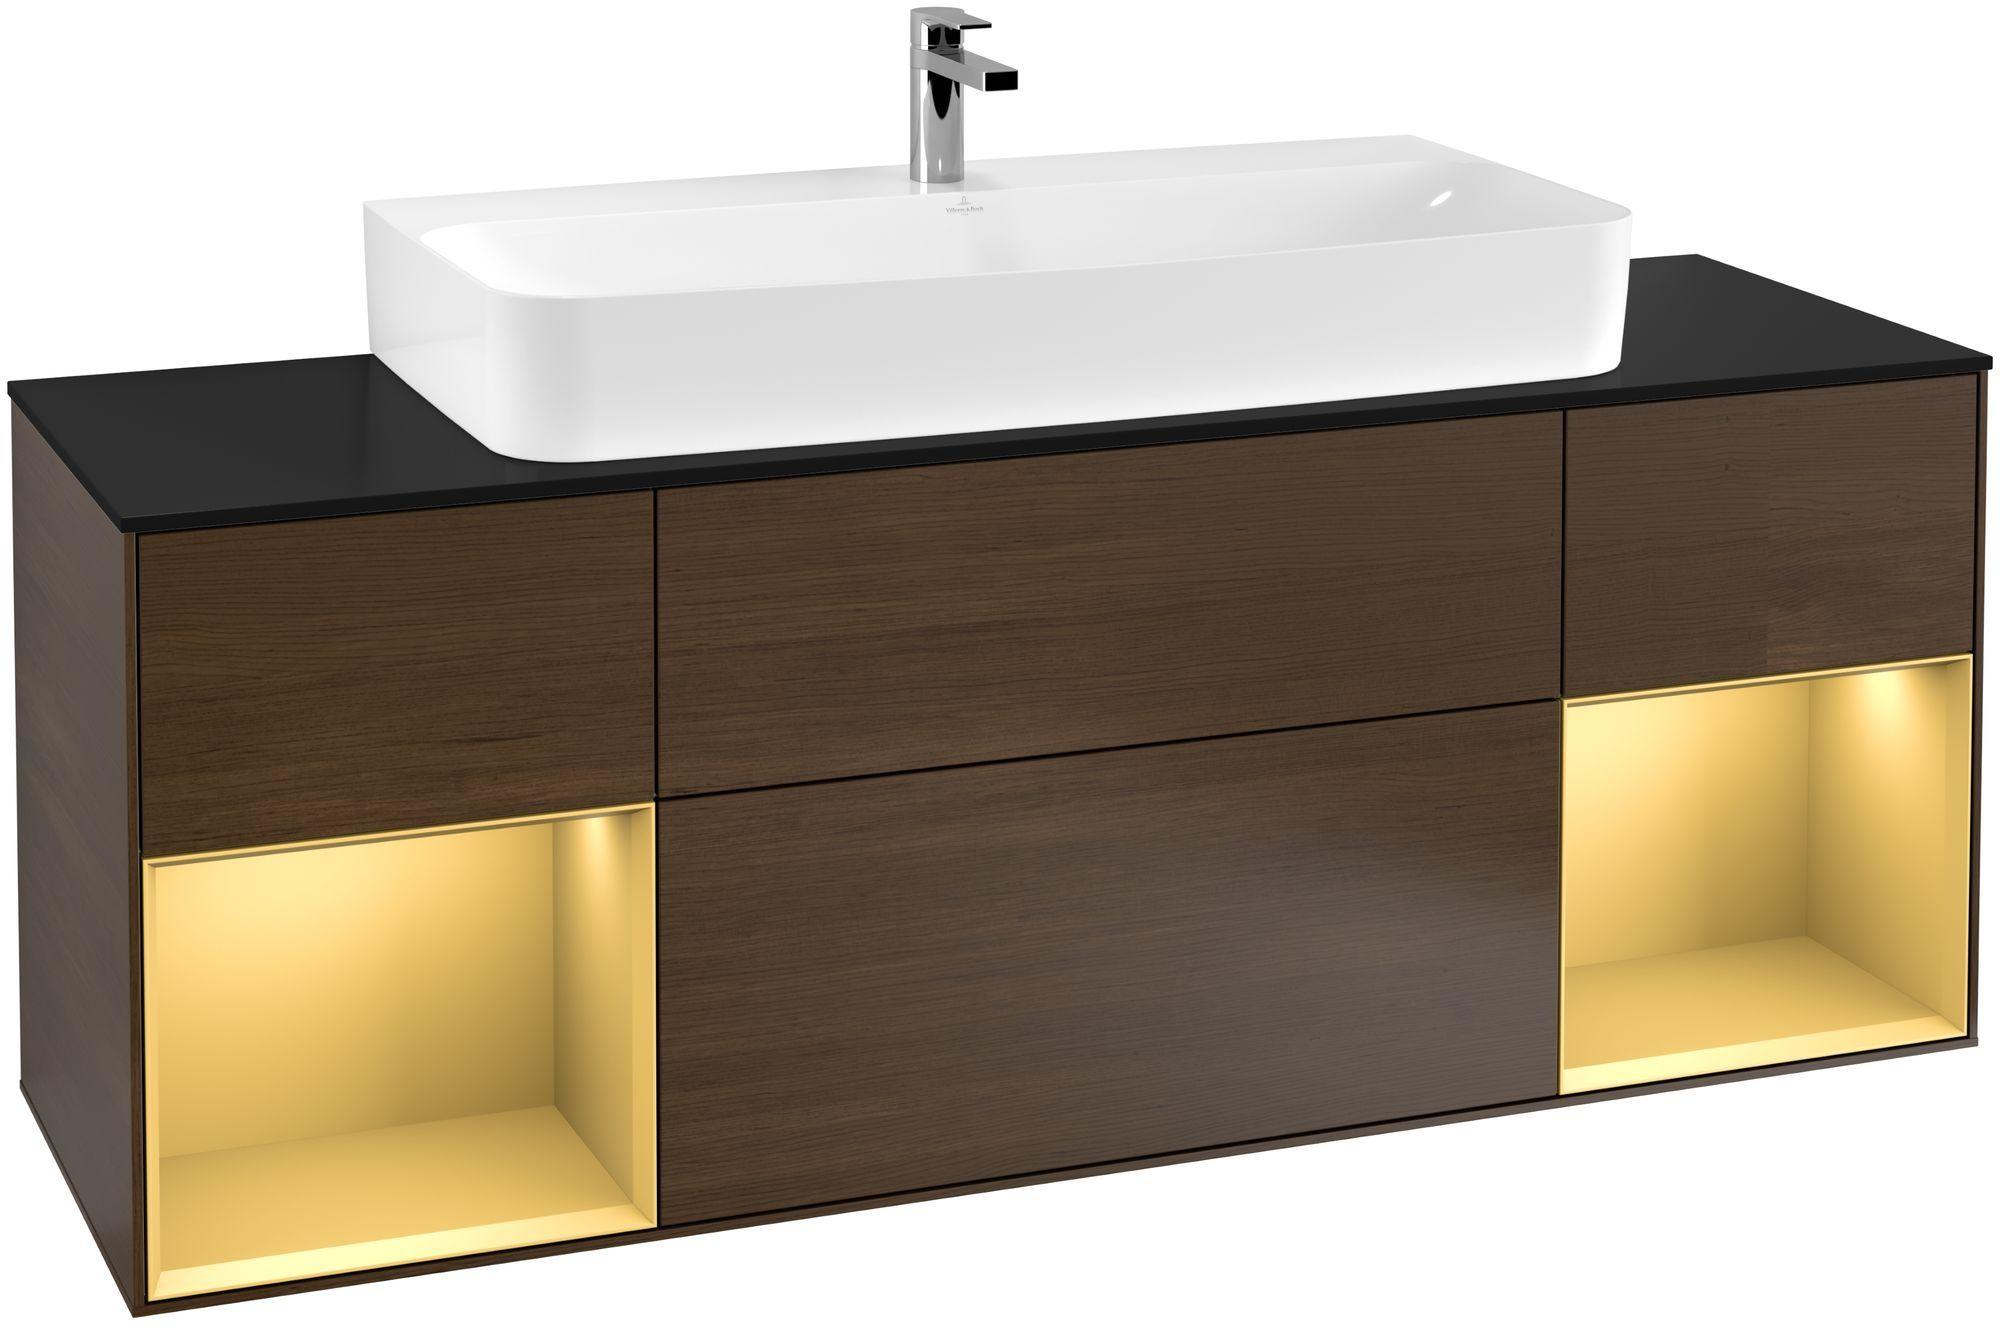 Villeroy & Boch Finion F21 Waschtischunterschrank mit Regalelement 4 Auszüge Waschtisch mittig LED-Beleuchtung B:160xH:60,3xT:50,1cm Front, Korpus: Walnut Veneer, Regal: Gold Matt, Glasplatte: Black Matt F212HFGN